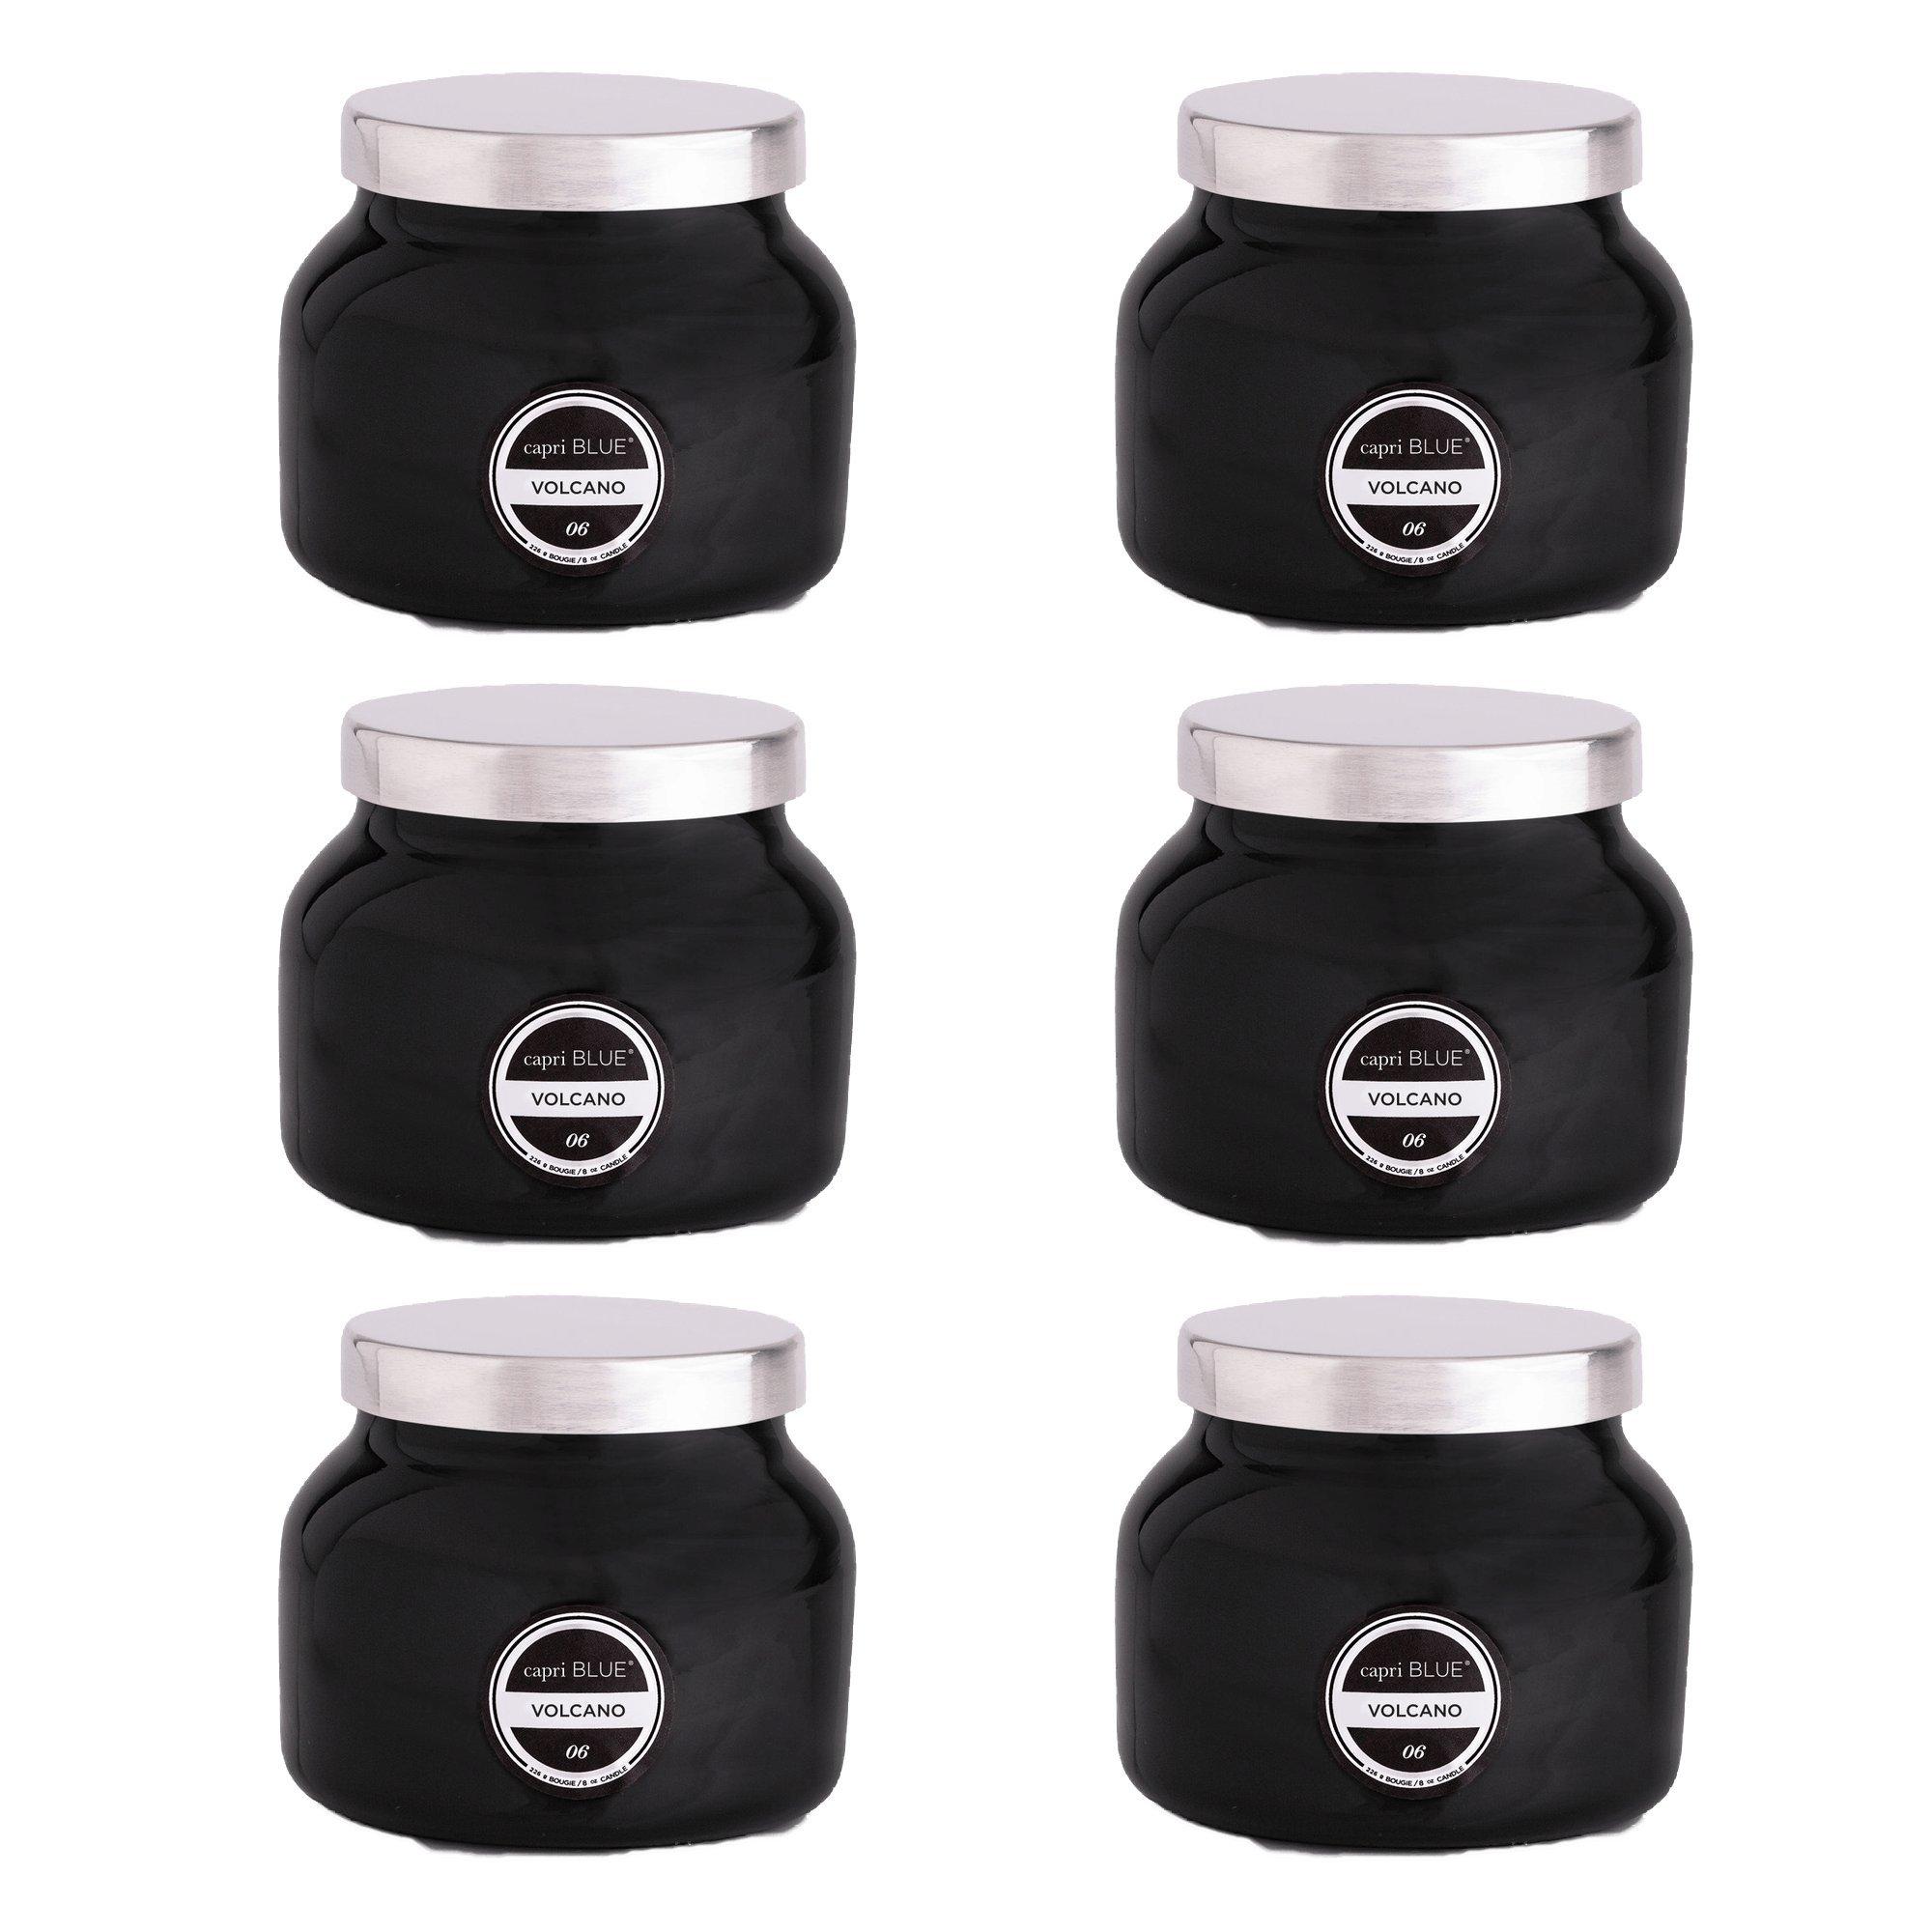 Capri Blue 8 oz Volcano Petite Signature Black Jar Candle (6 pack)